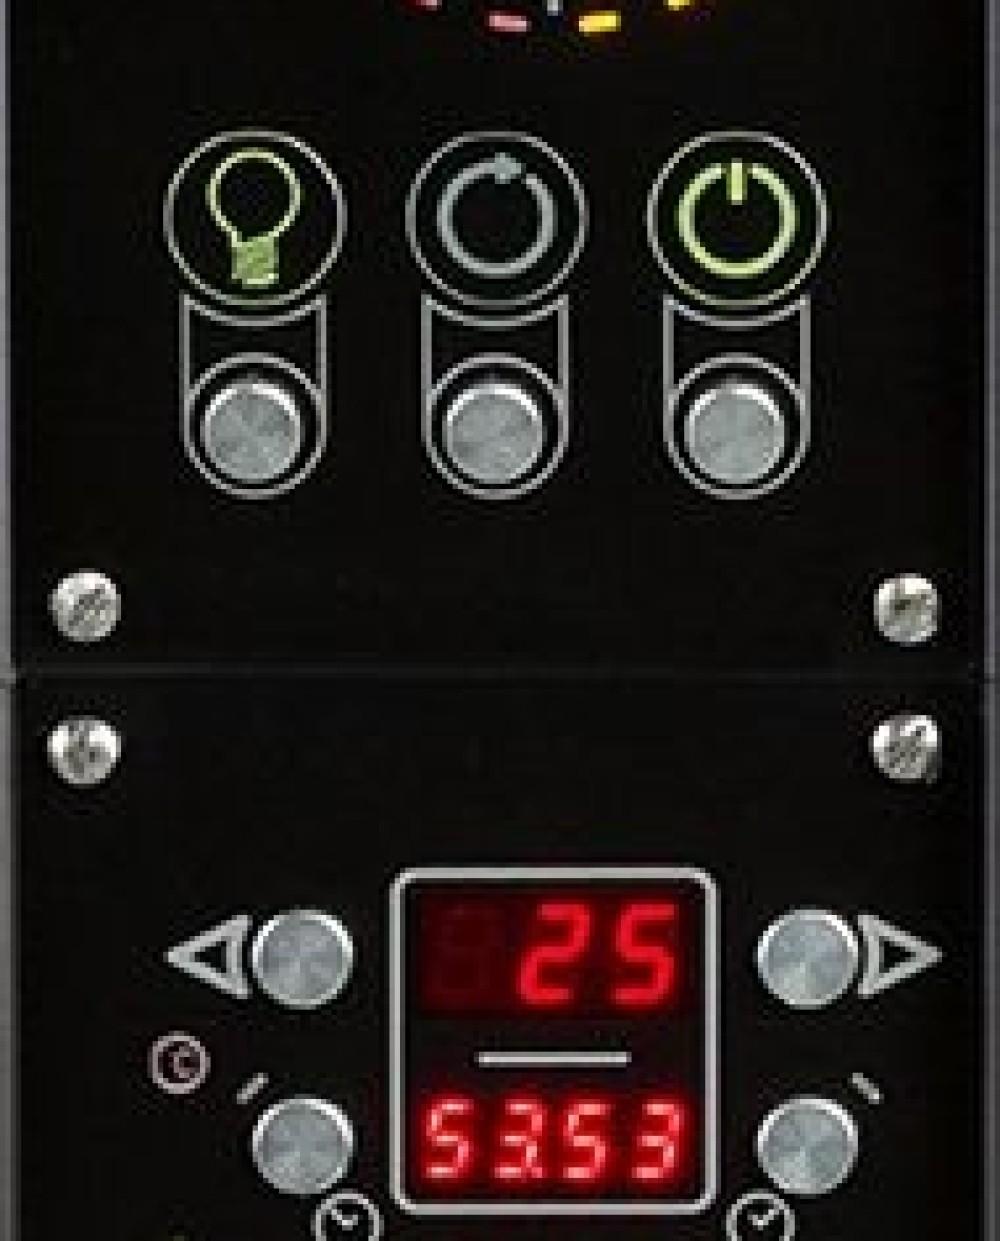 Fornitalia Black Line BL 125/70 moduláris pizzasütő